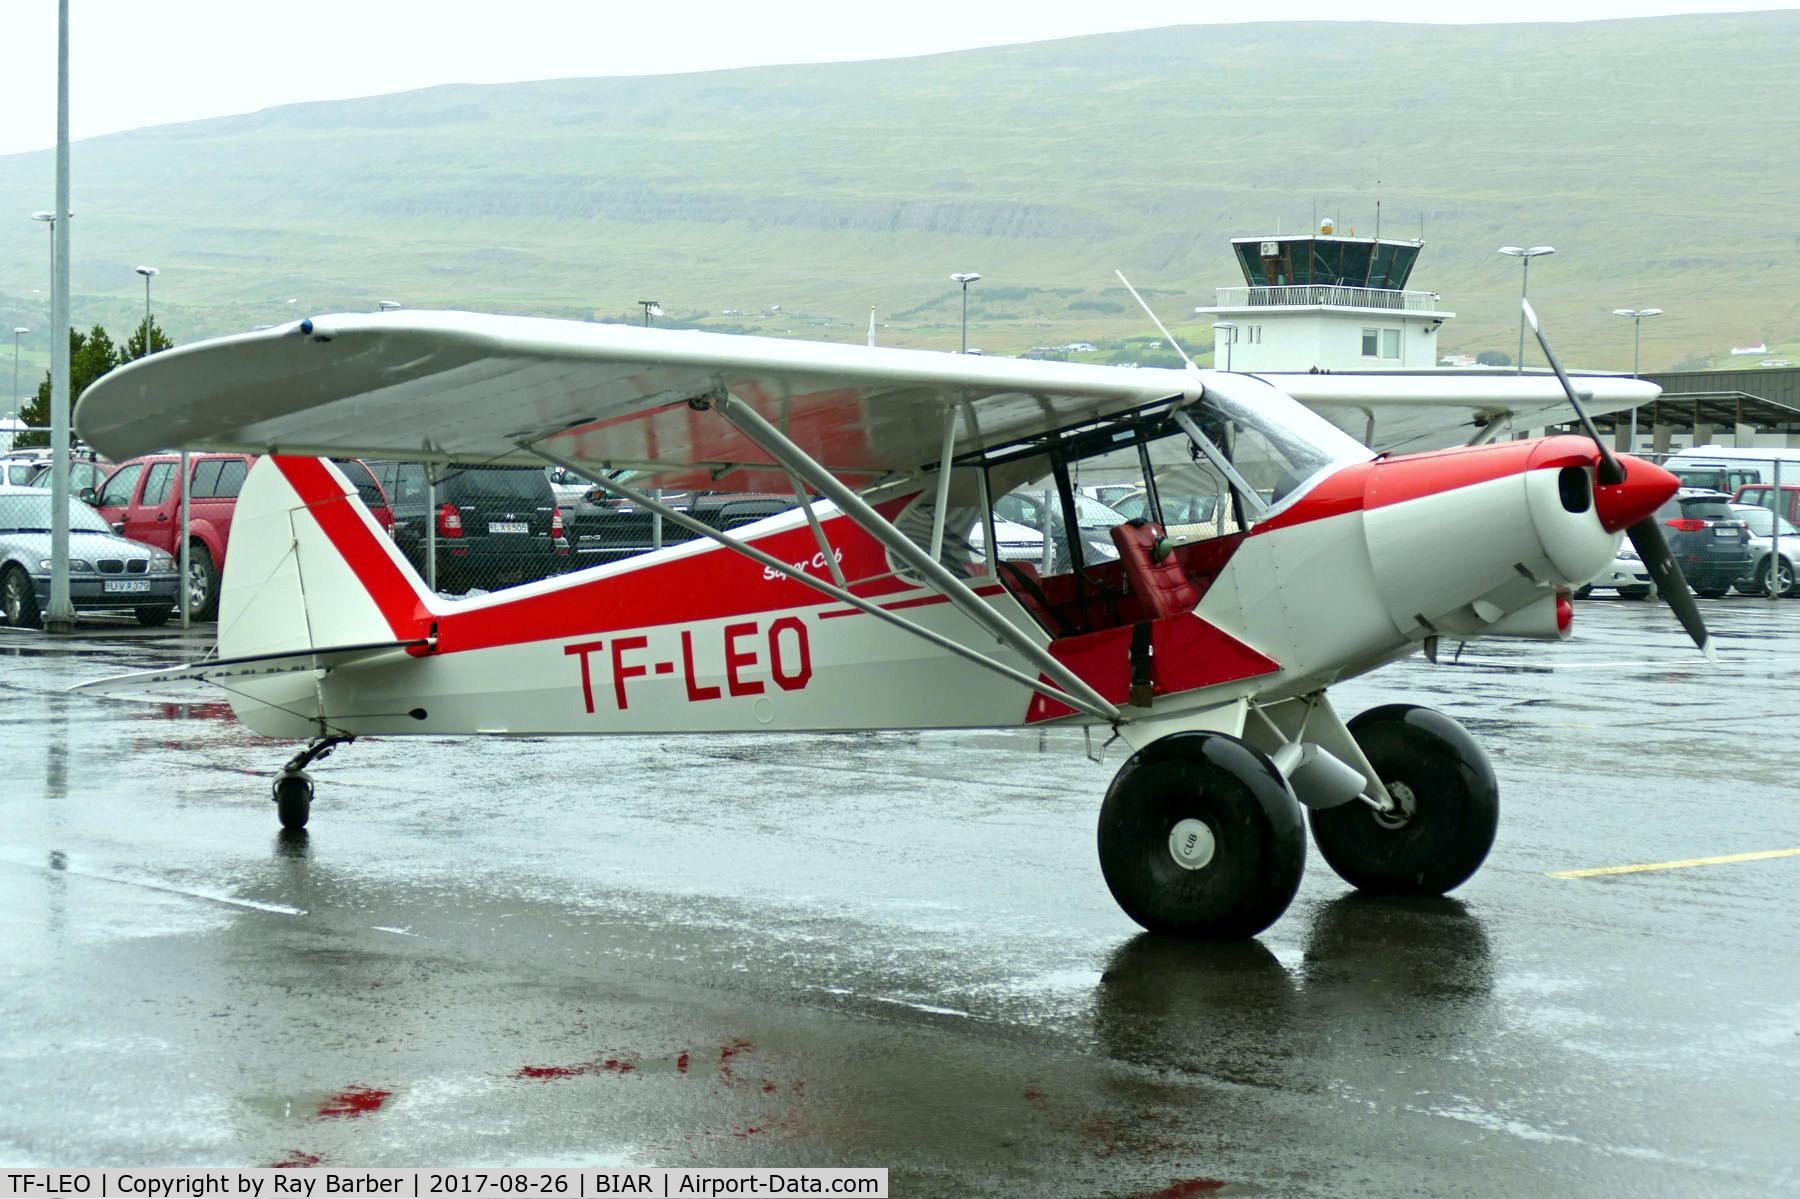 TF-LEO, Piper PA-18-150 Super Cub C/N 18-7509074, TF-LEO   Piper PA-18-150 Super Cub [18-7509074] (Flugsafn Islands) Akureyri~TF 26/08/2017